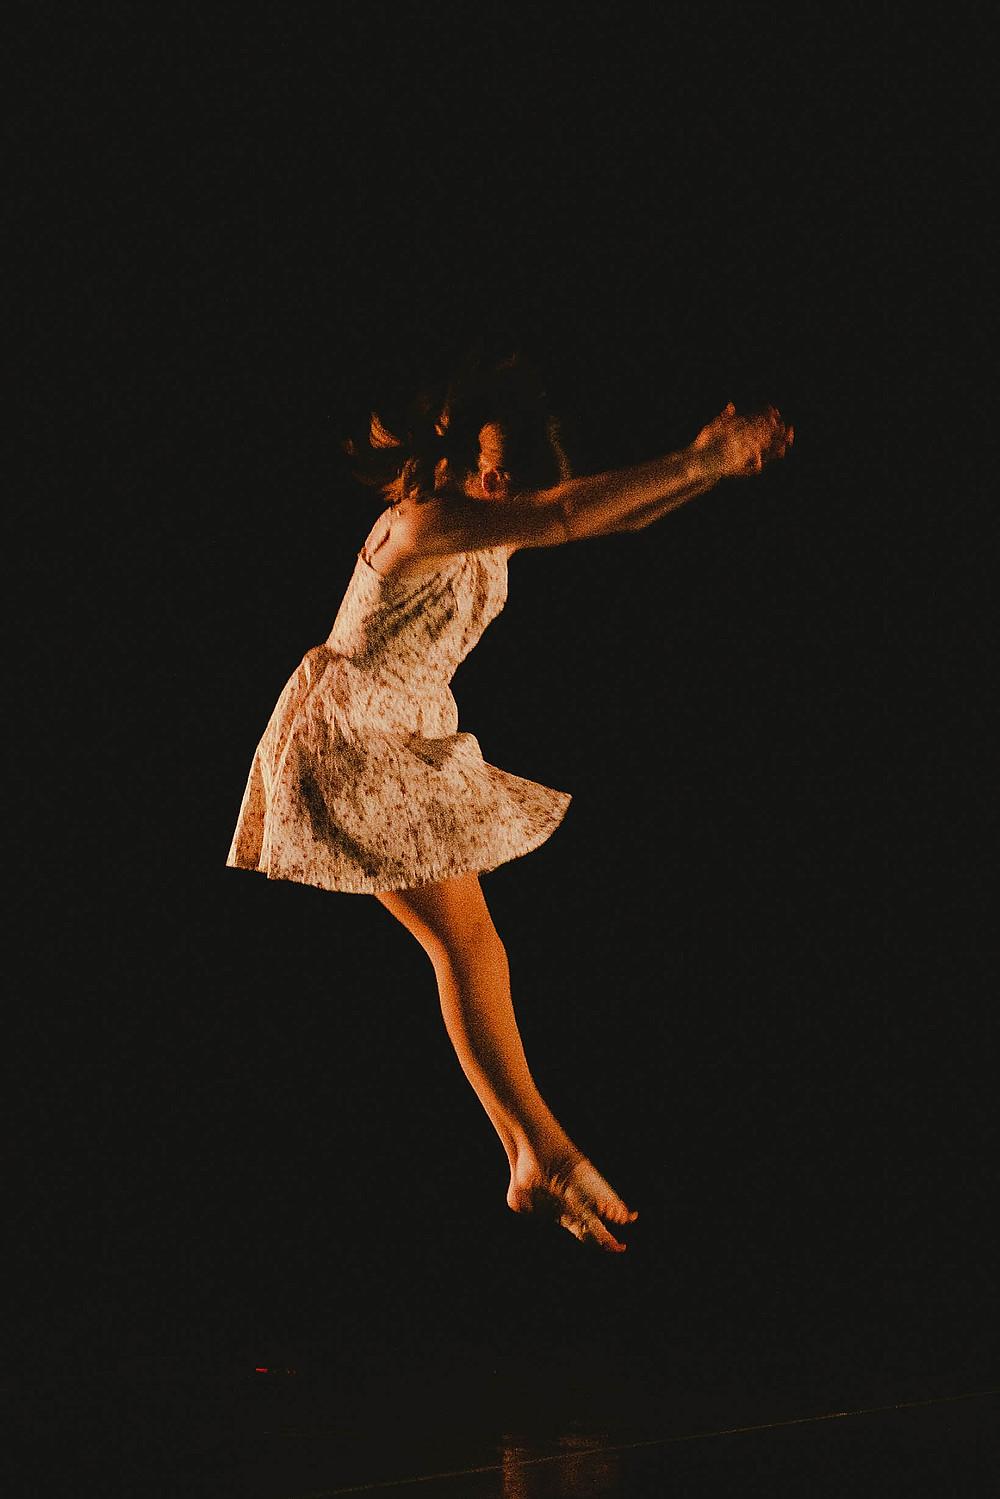 young dancer portrait during dance recital